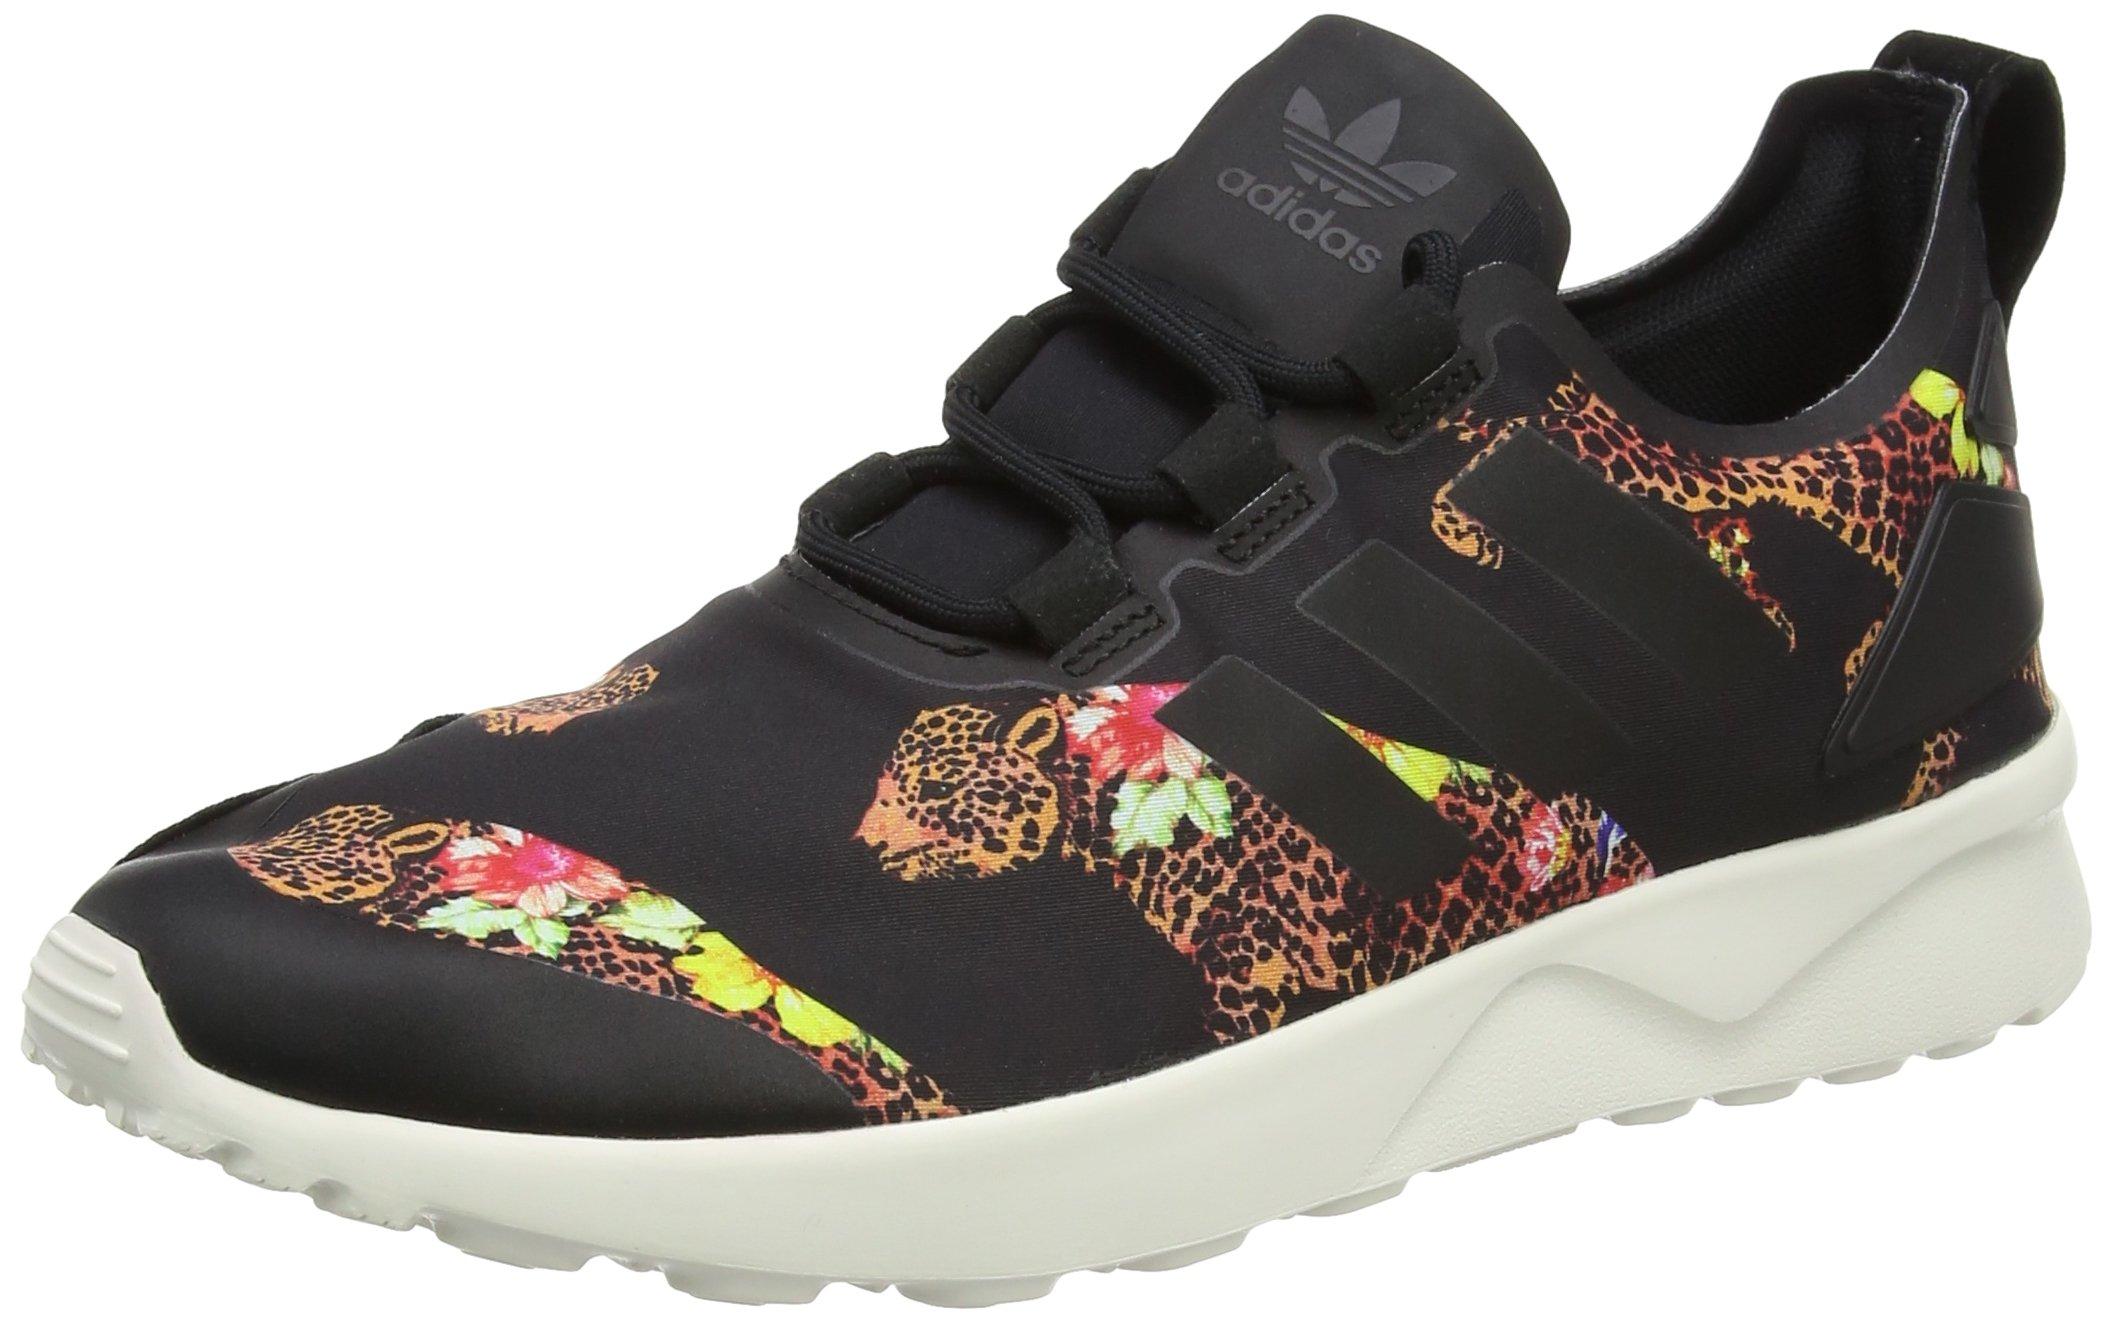 VerveSneakers 2 3 Basses Adidas Flux core FemmeMulticolore Black36 Eu Zx Adv White vN0OmP8nyw